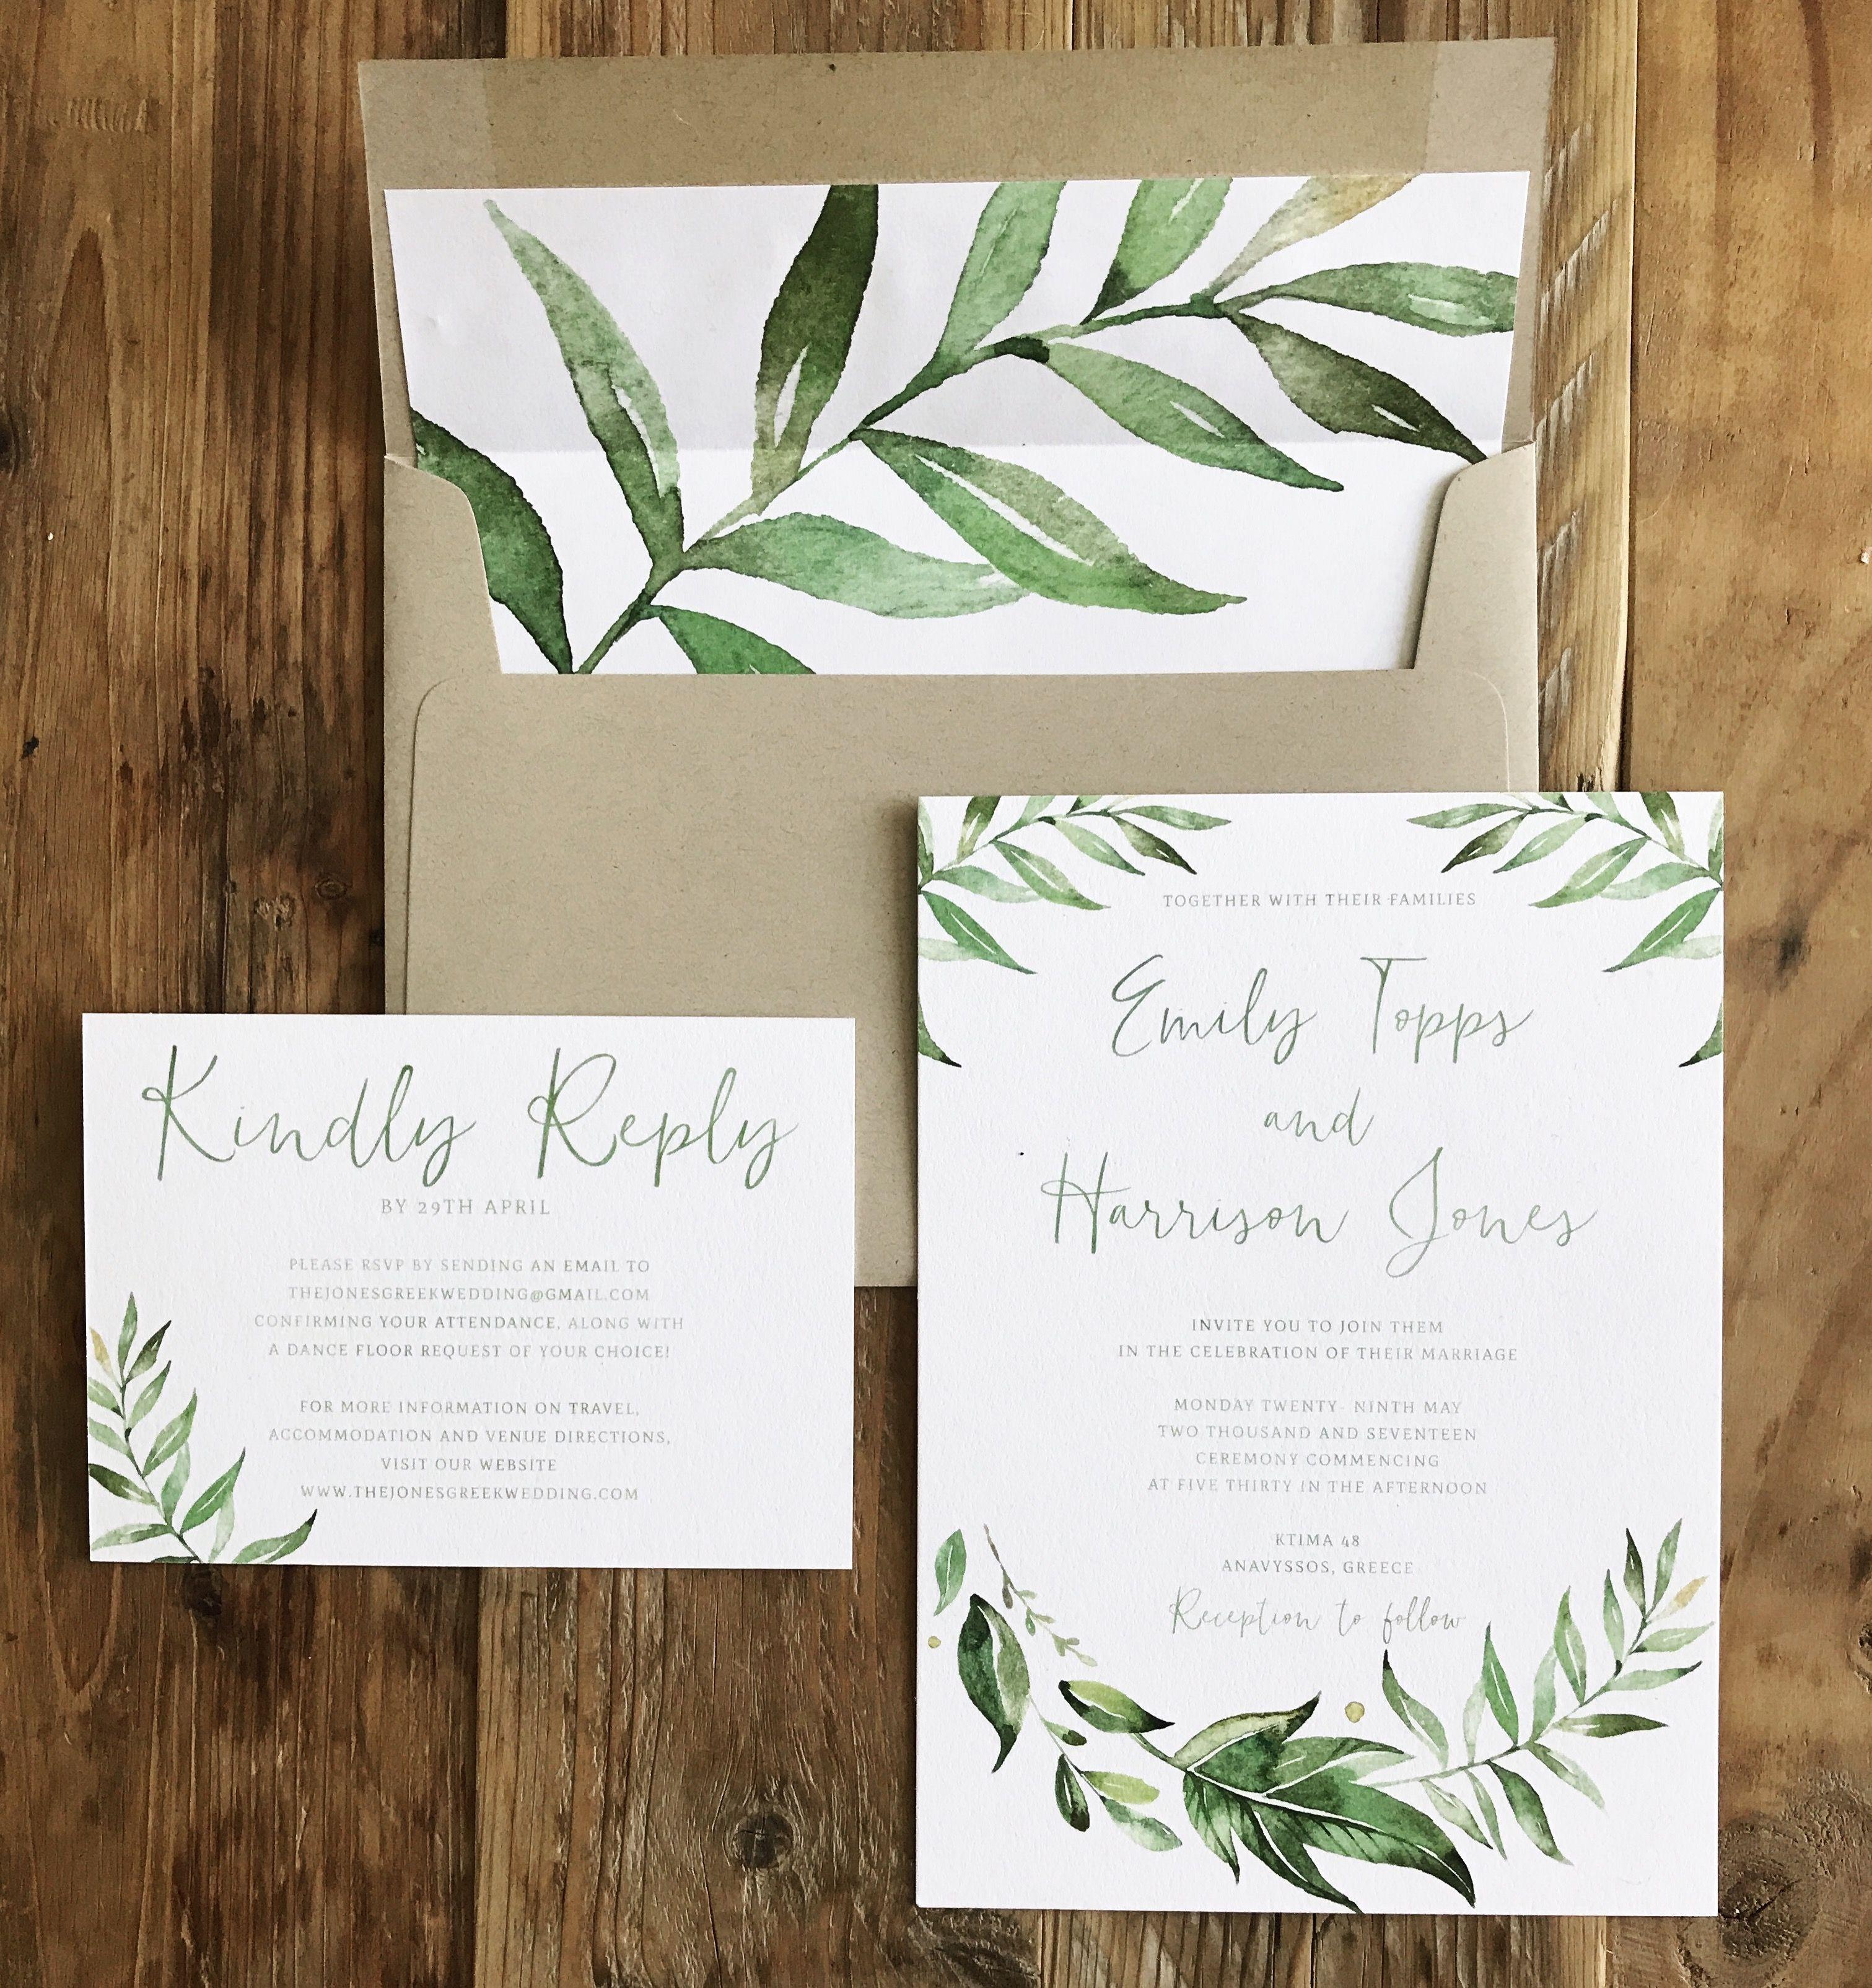 Pin by Emily Topps on The Jones Greek Wedding | Pinterest | Greek ...